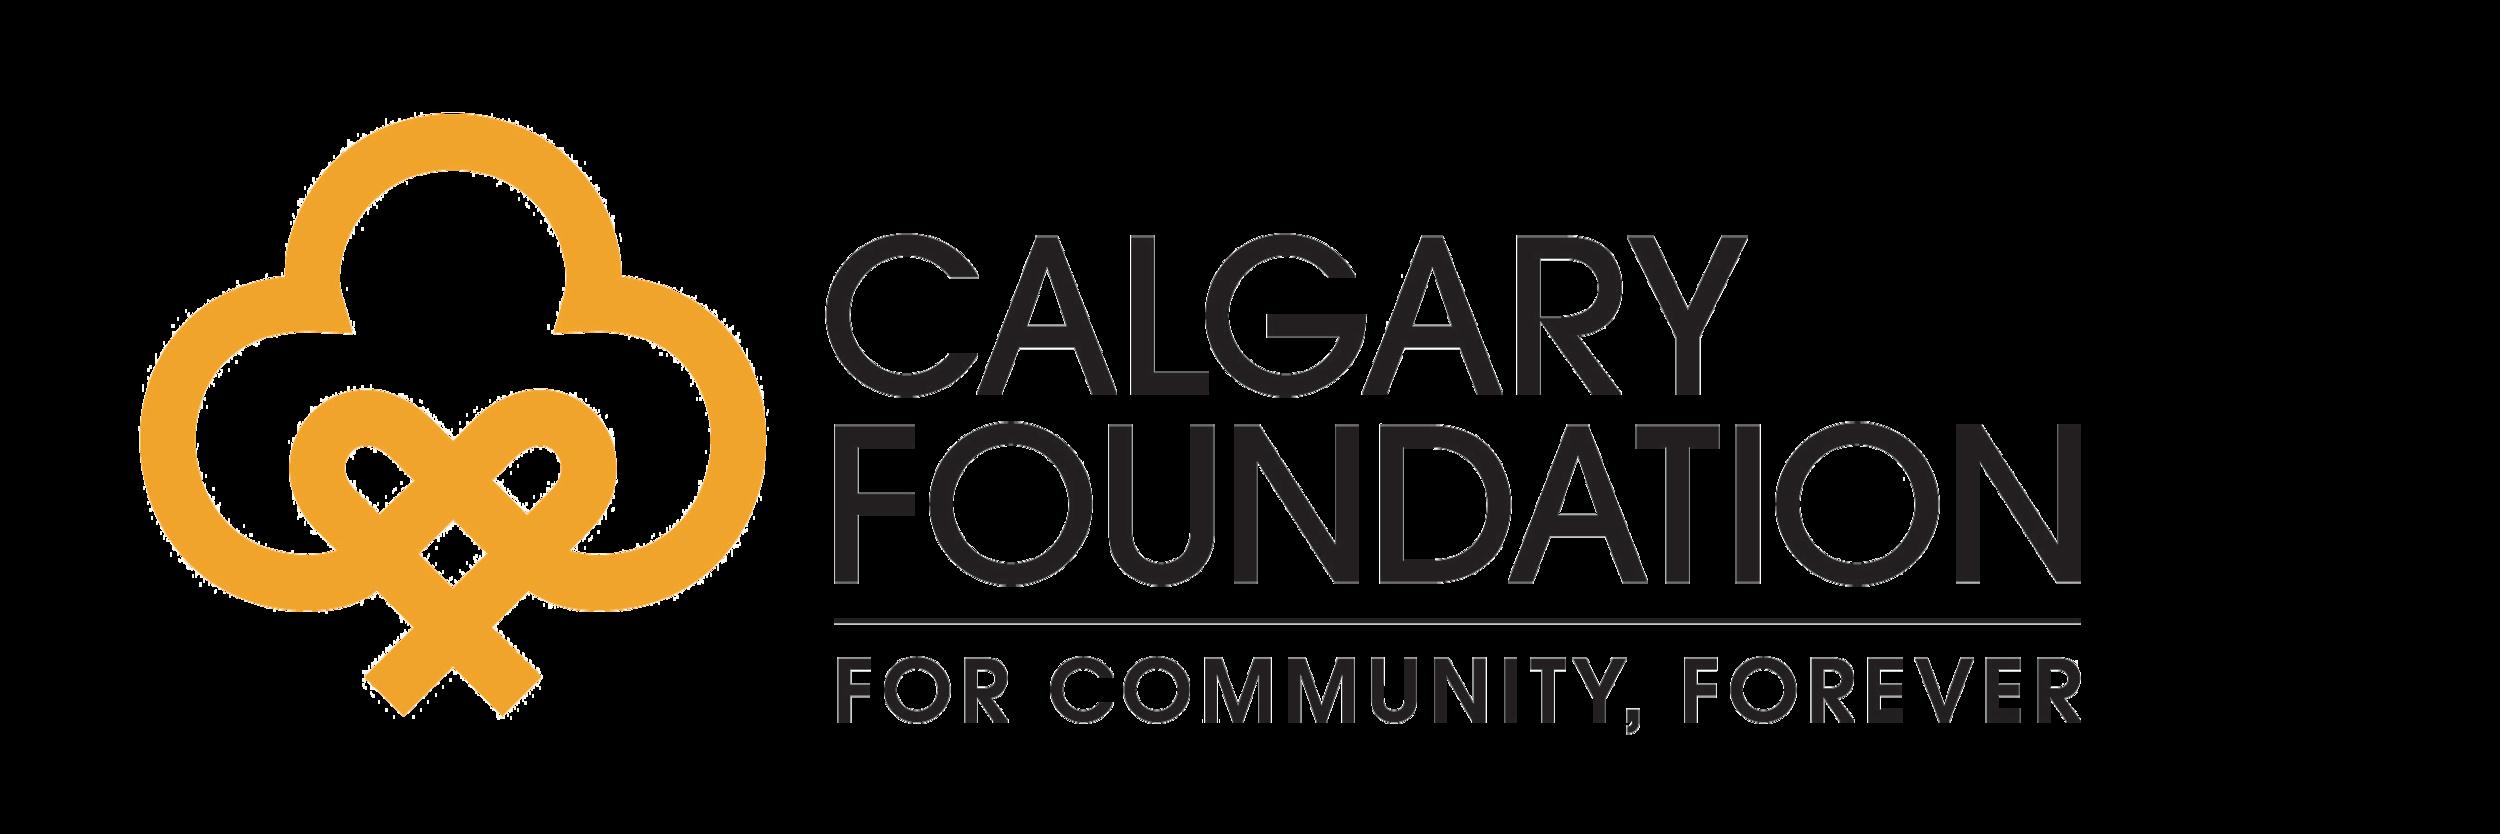 calgary foundation logo .png